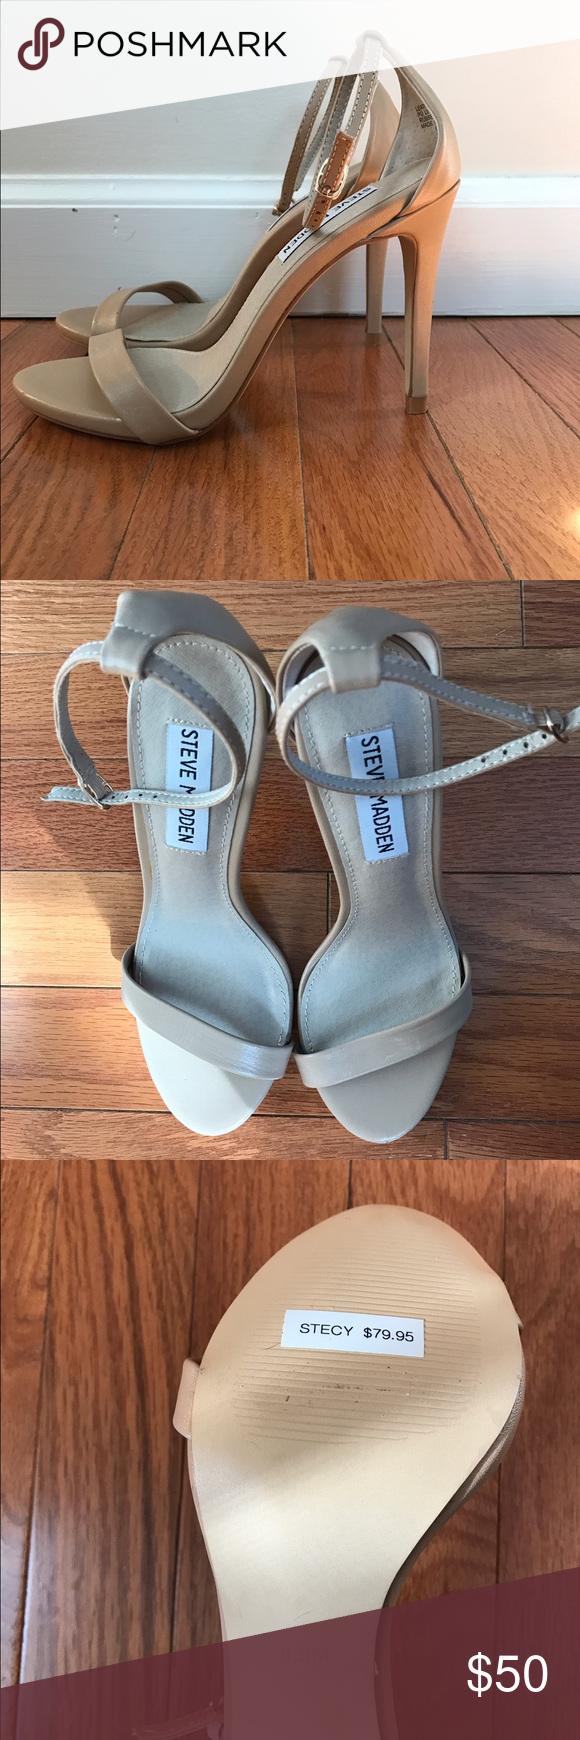 Steve Madden Stecy nude Nude ankle strap heels! Never worn! Steve Madden Shoes Heels